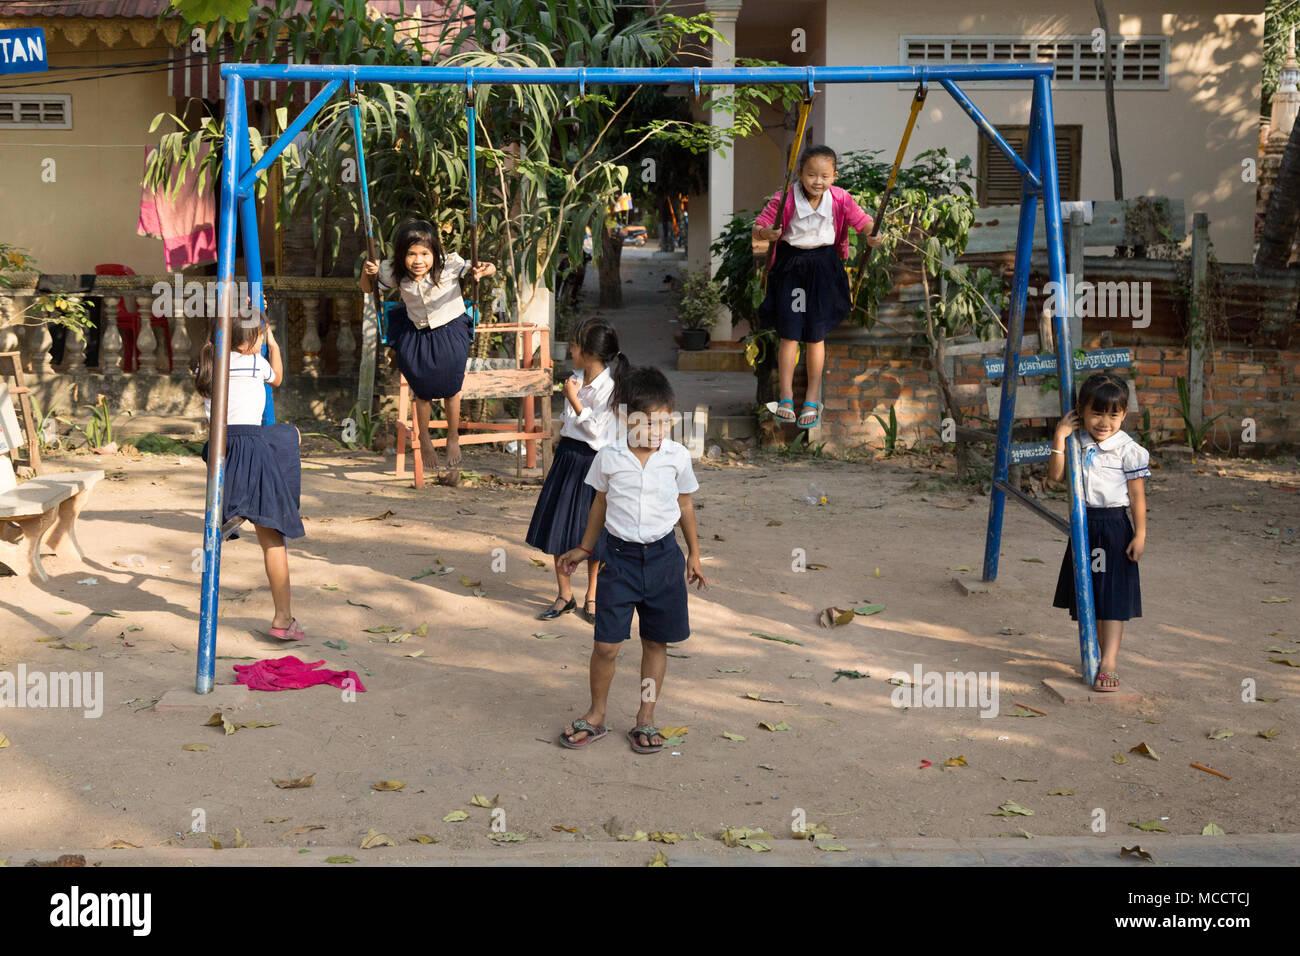 Asian schoolchildren - Cambodian primary school children in school playground, Siem Reap, Cambodia, Asia Stock Photo